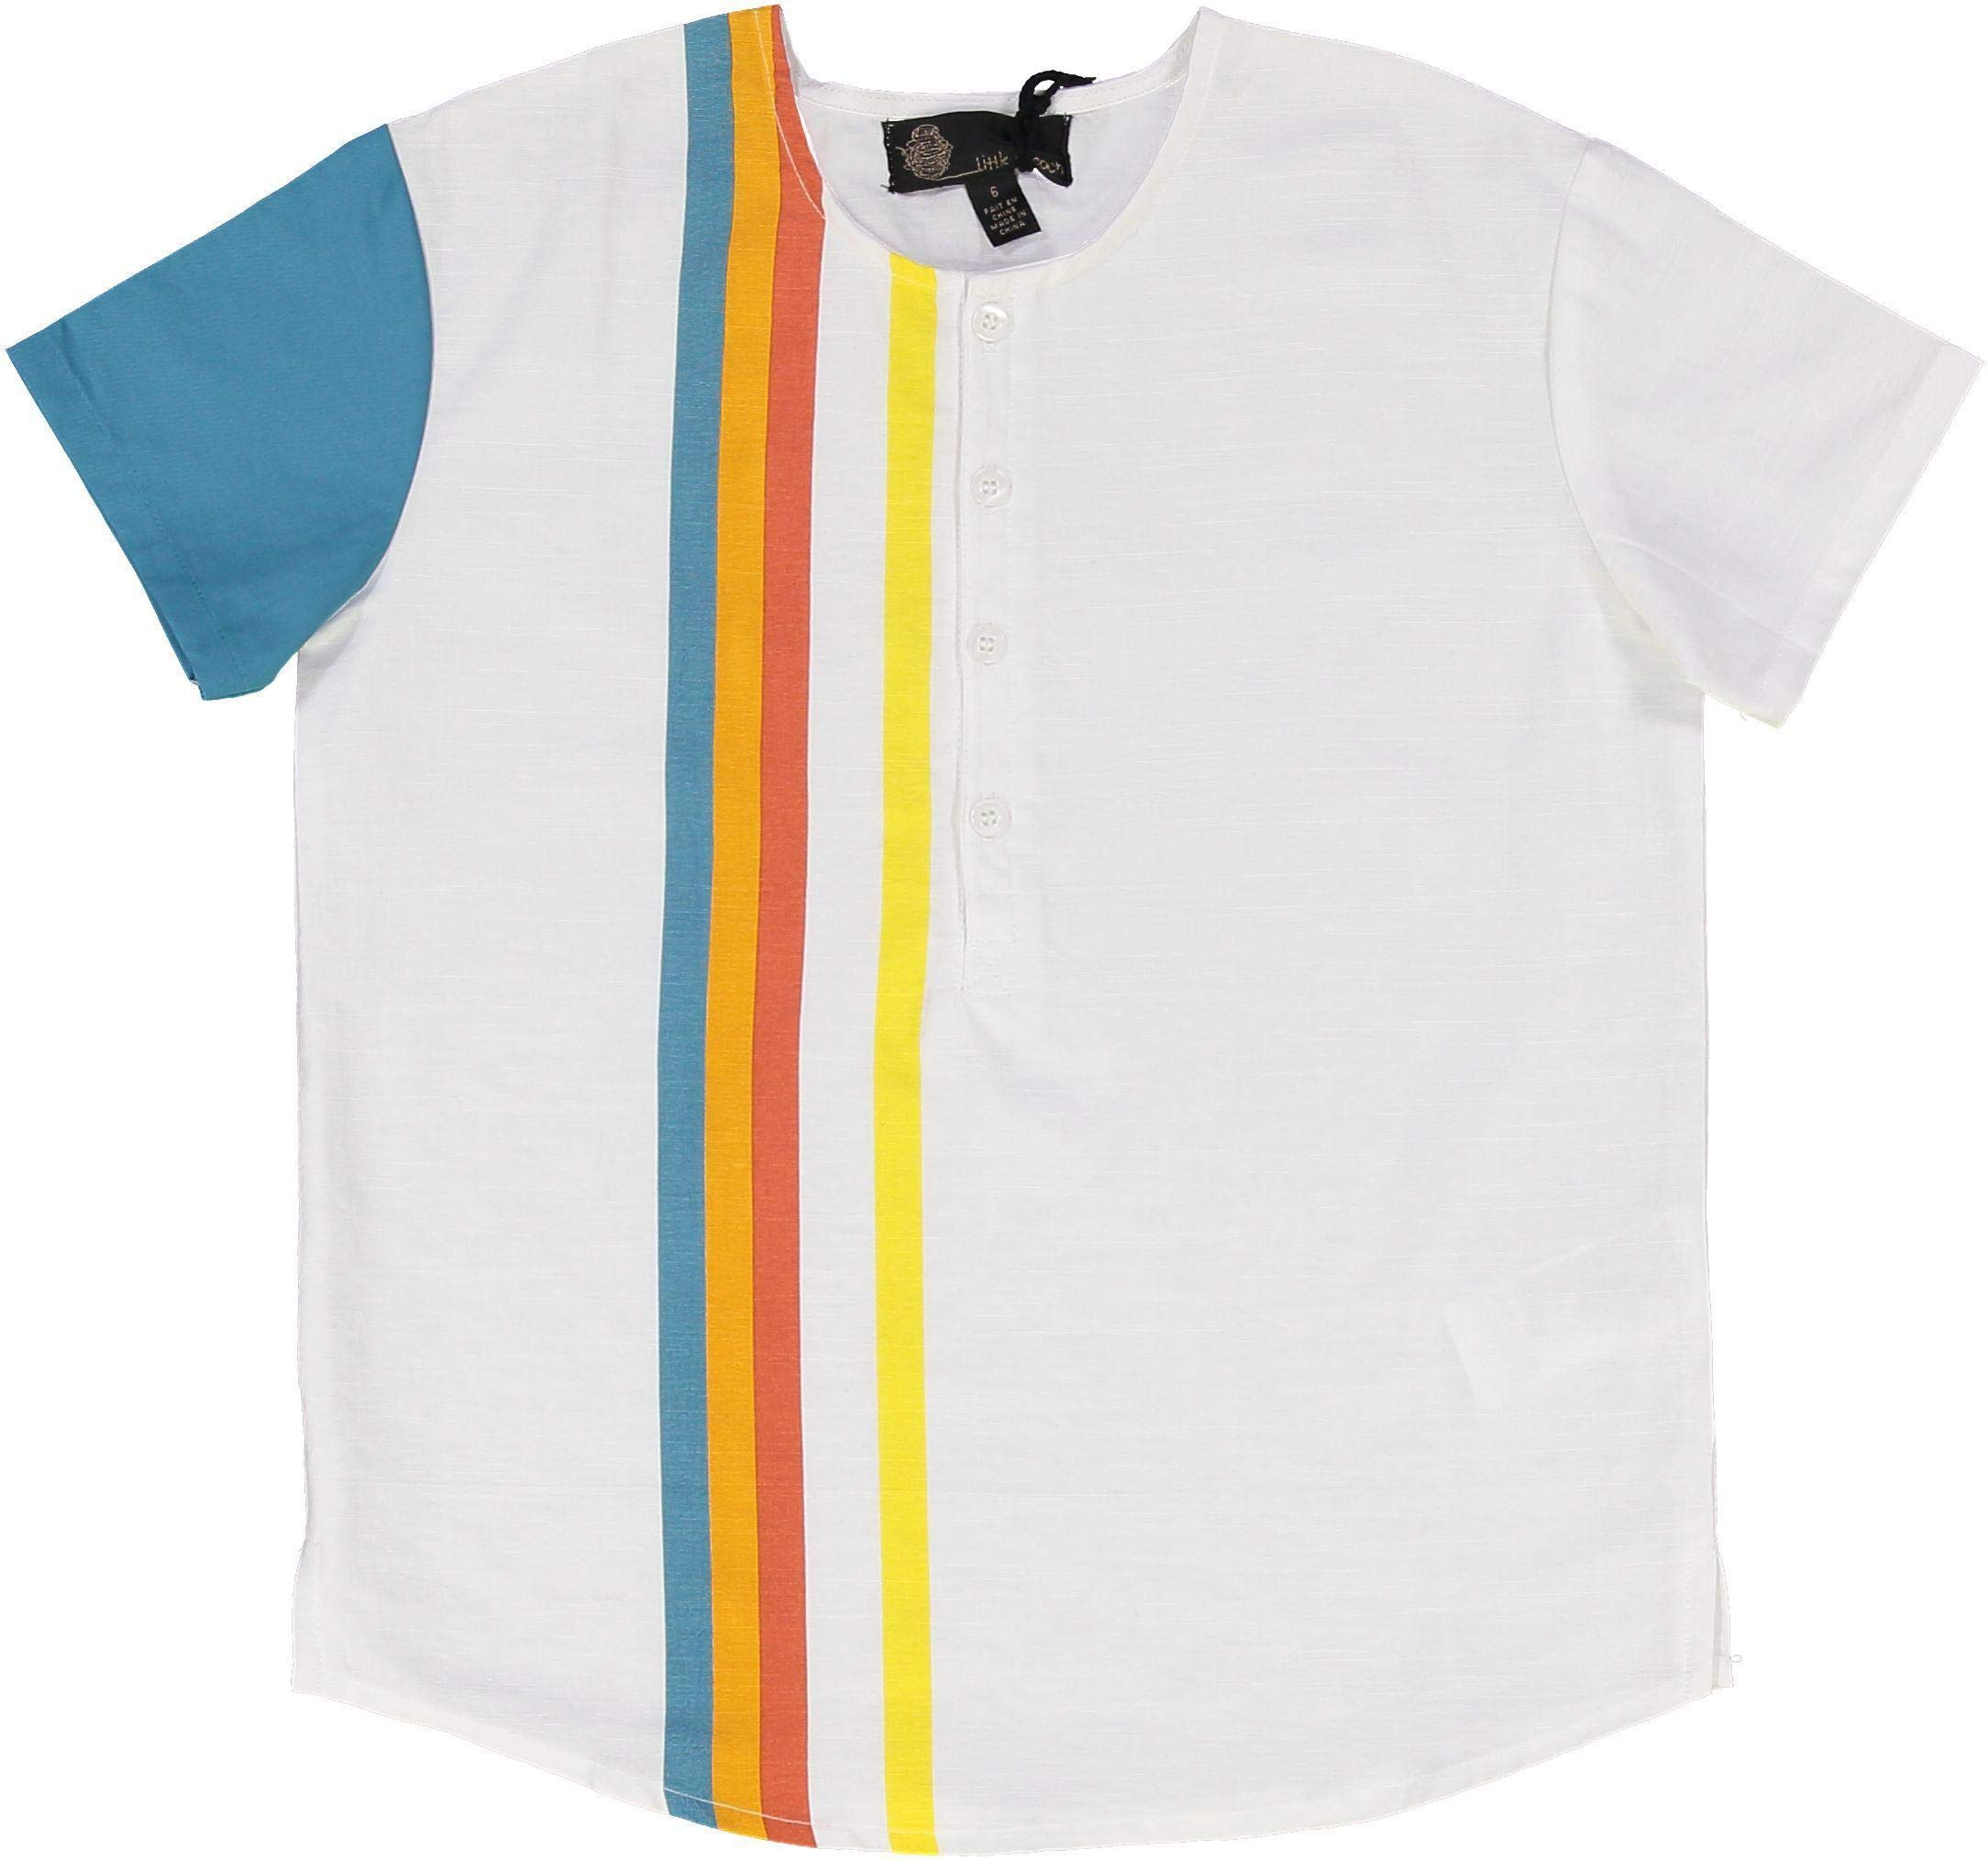 Little Cocoon Boys Short Sleeve Dress Shirt with No Collar - TD1910 - Rainbow, 18 Months